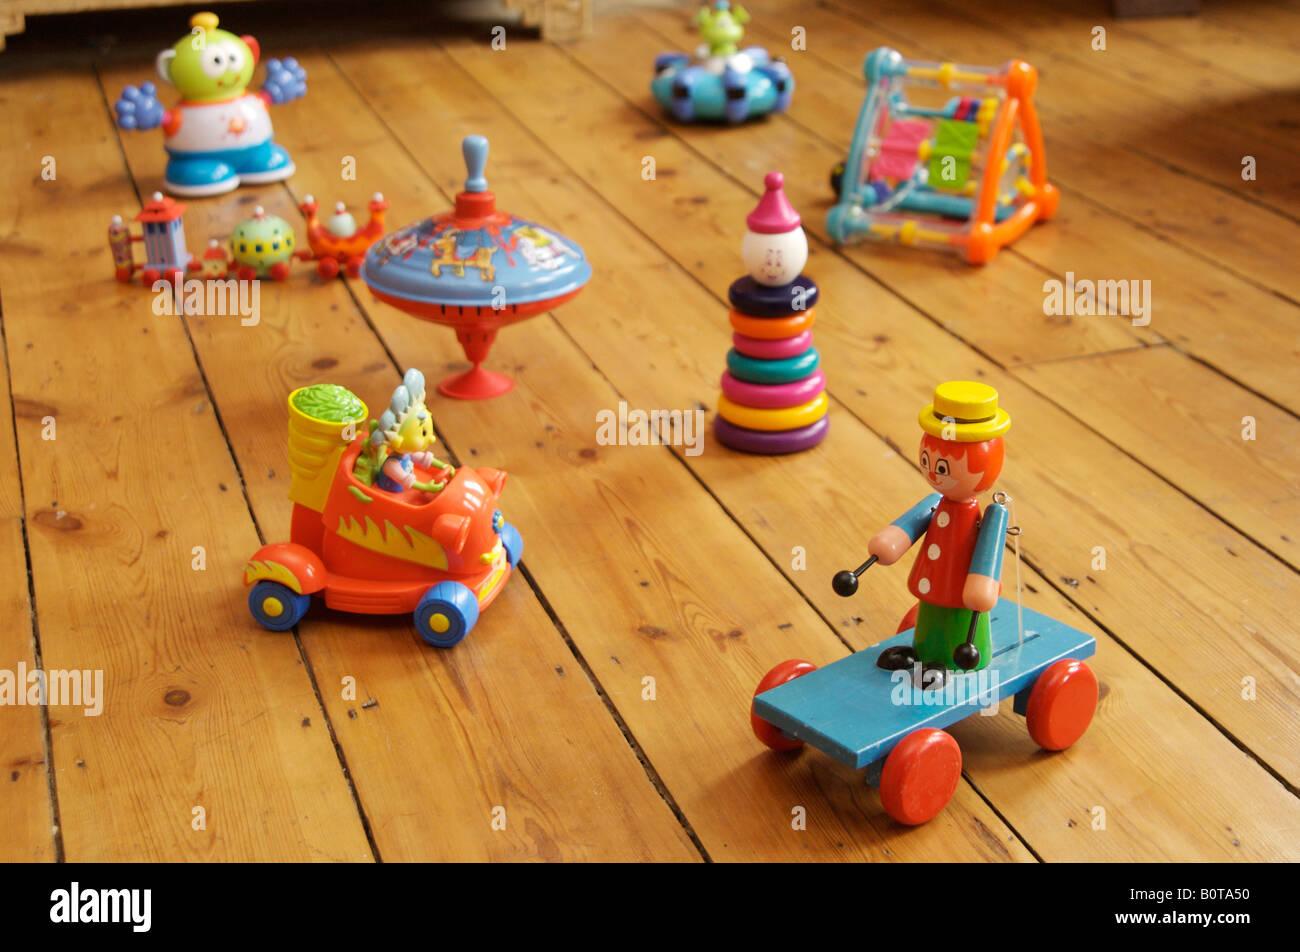 Children39s Toys On Wooden Floor Stock Photo 17745196 Alamy